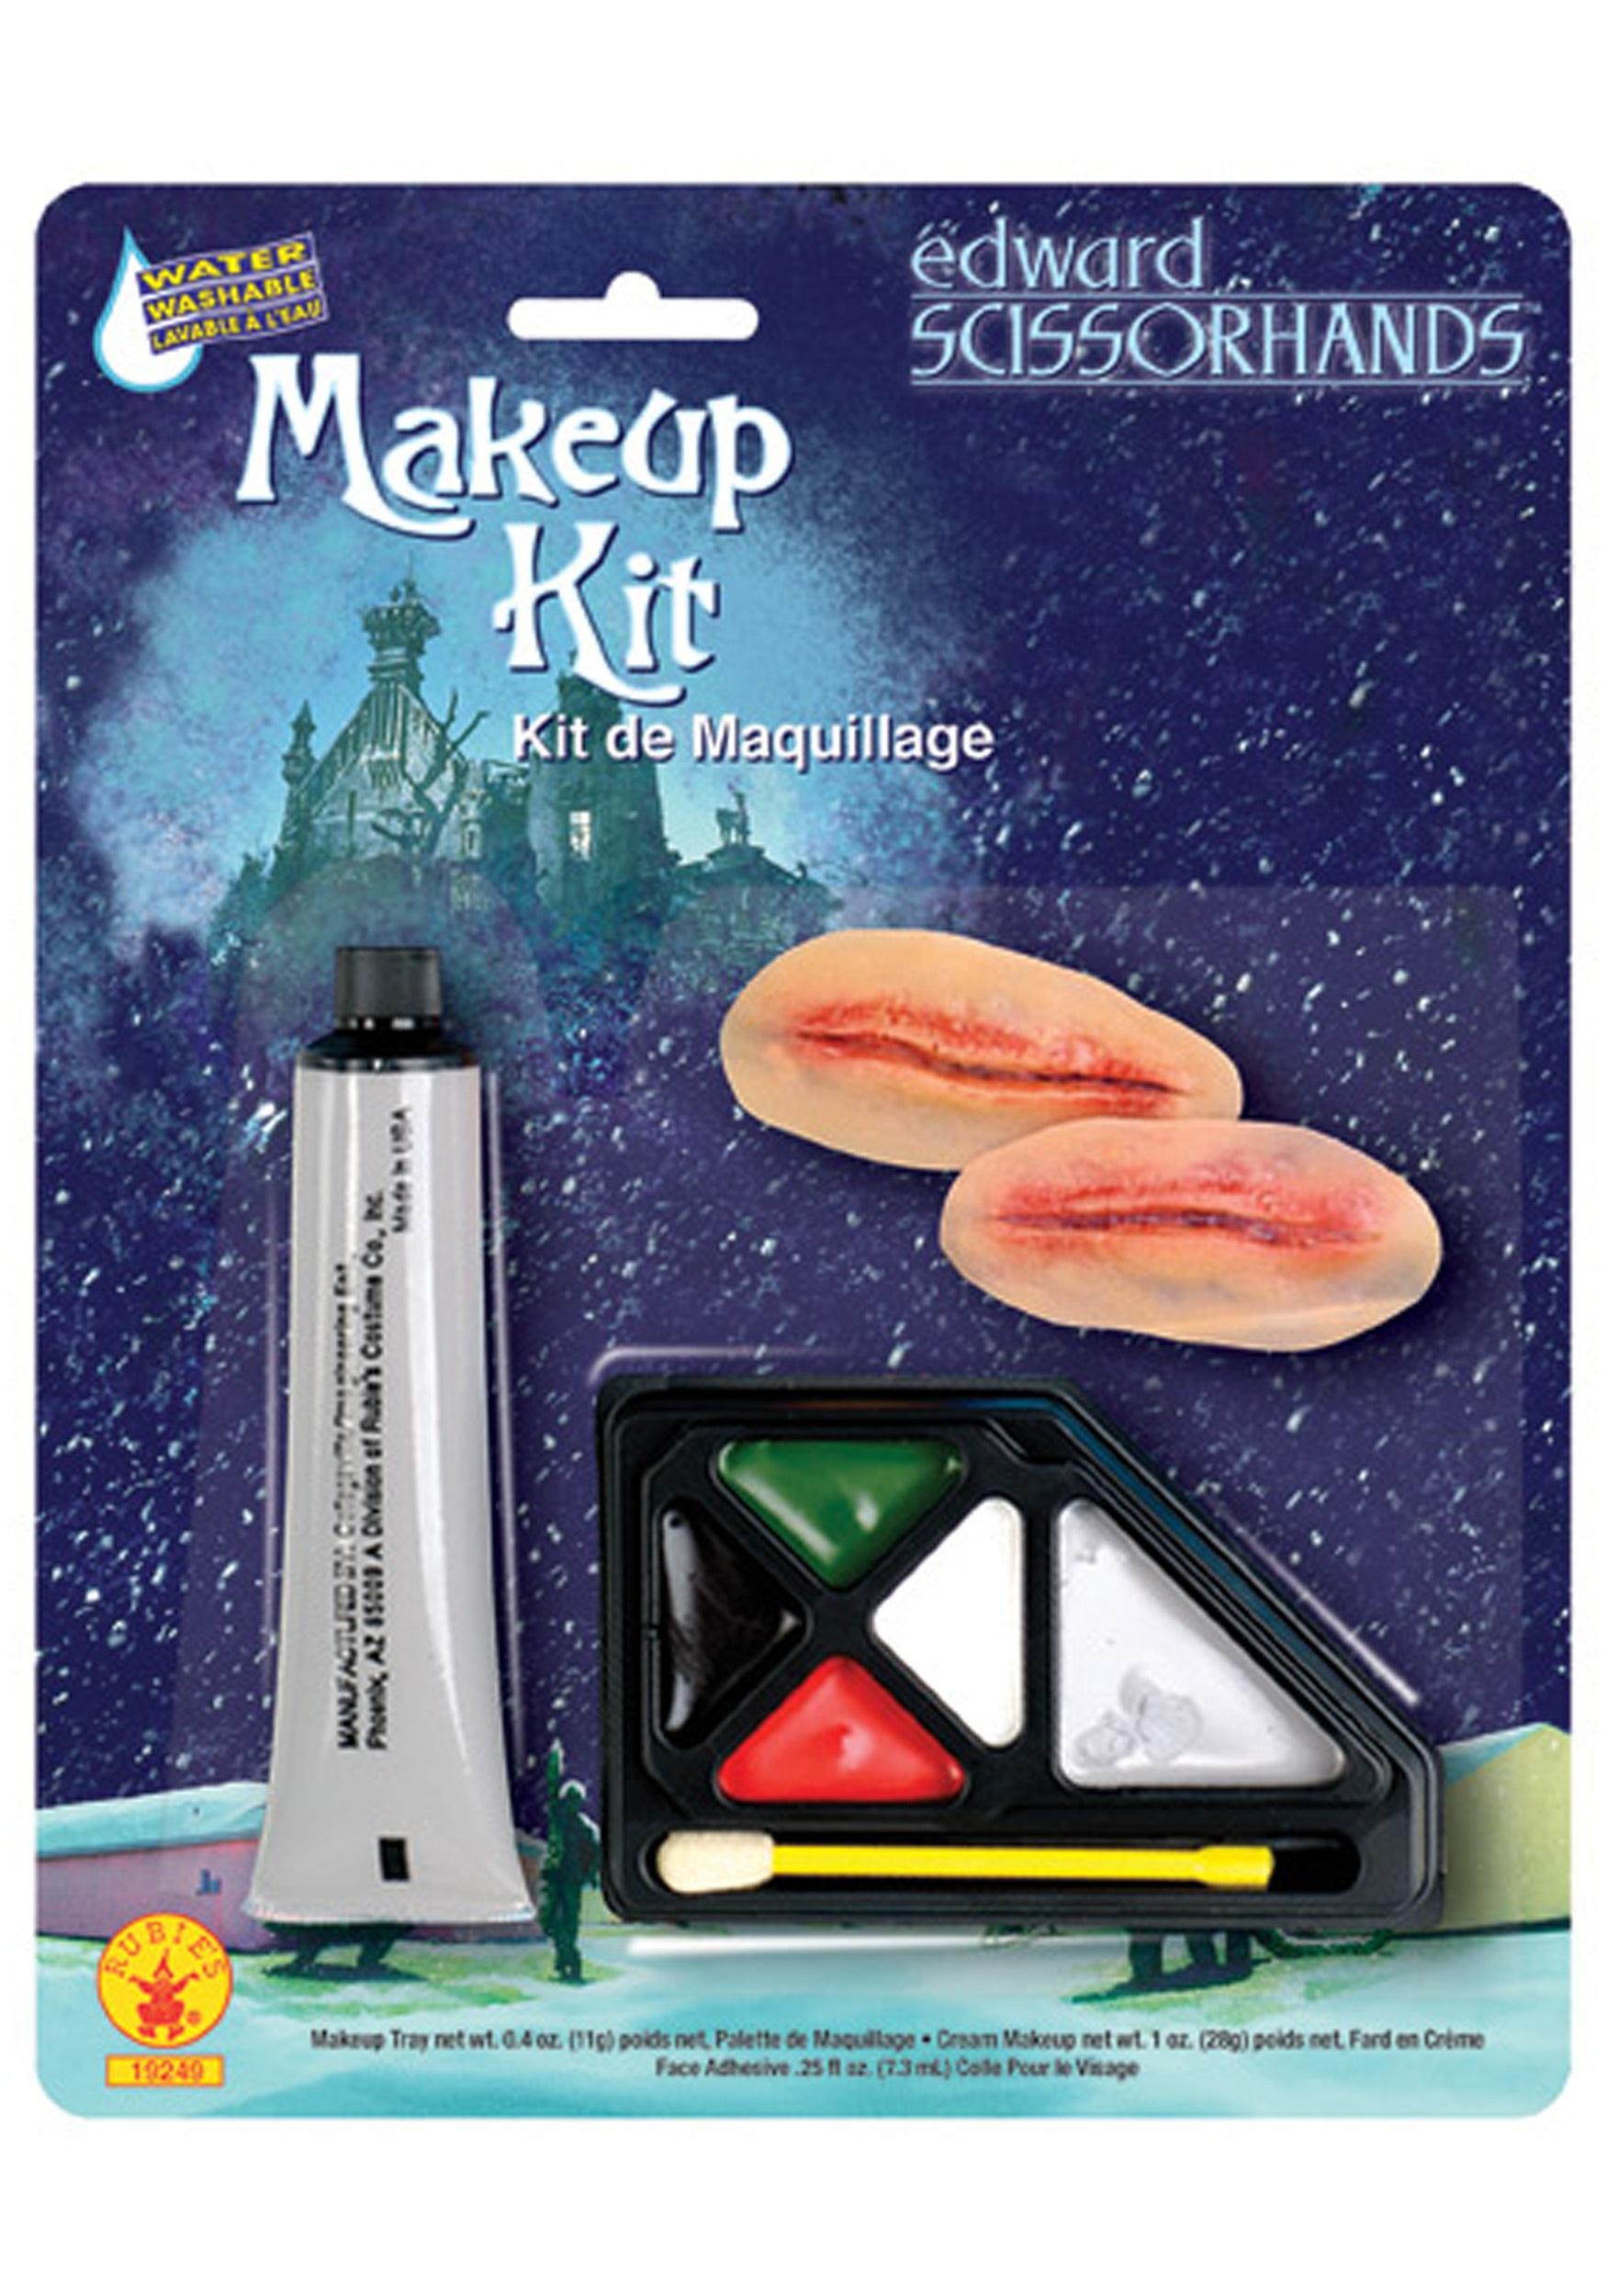 Costumes For All Occasions Ru19249 Edward Scissorhands Makeup Kit RU19249